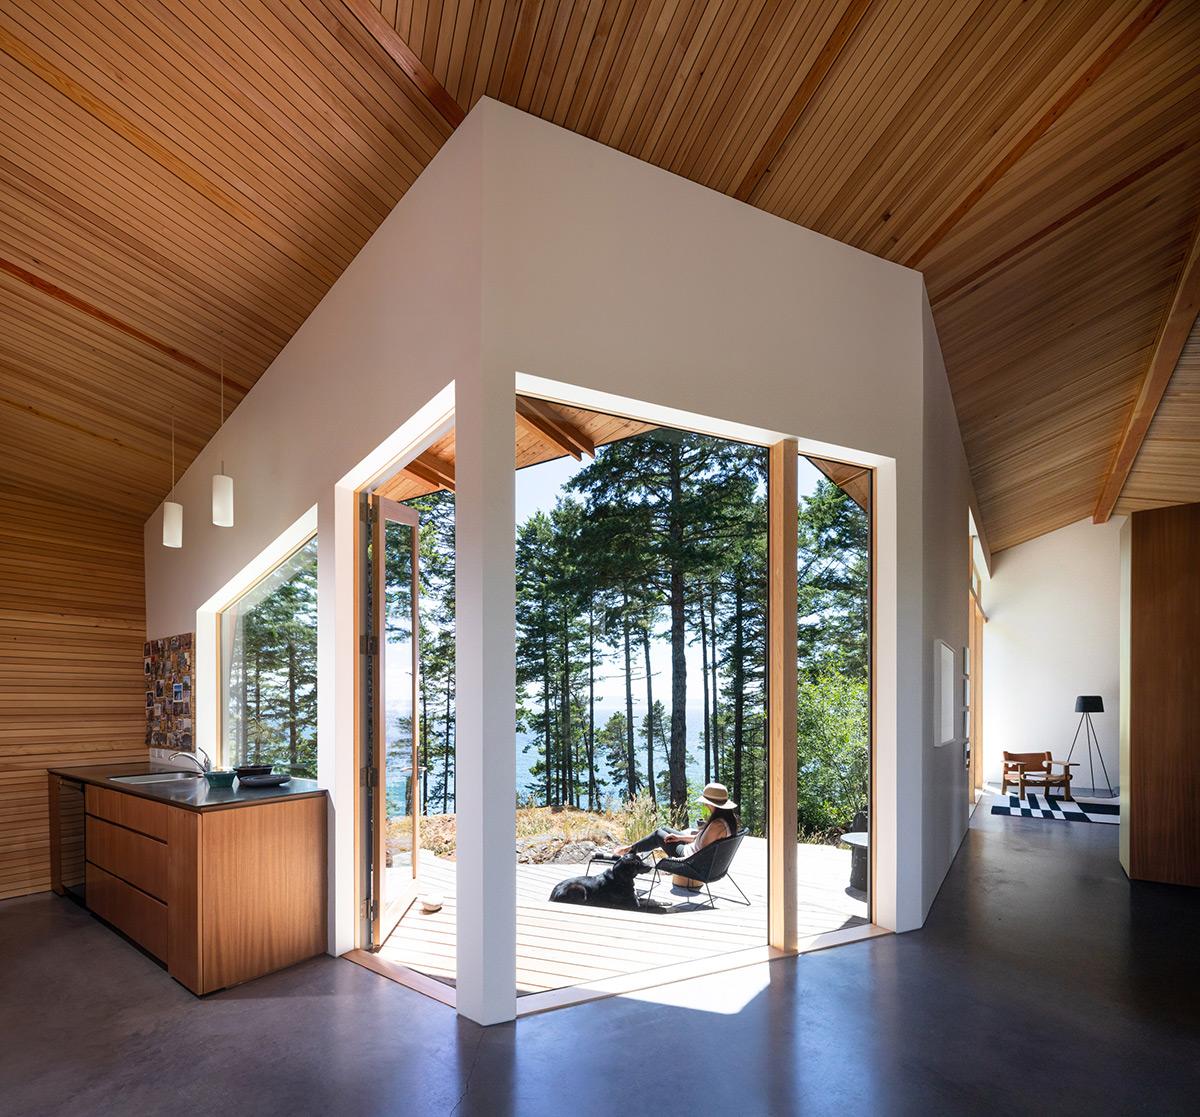 Sooke-01-House-Campos-Studio-Ema-Peter-04